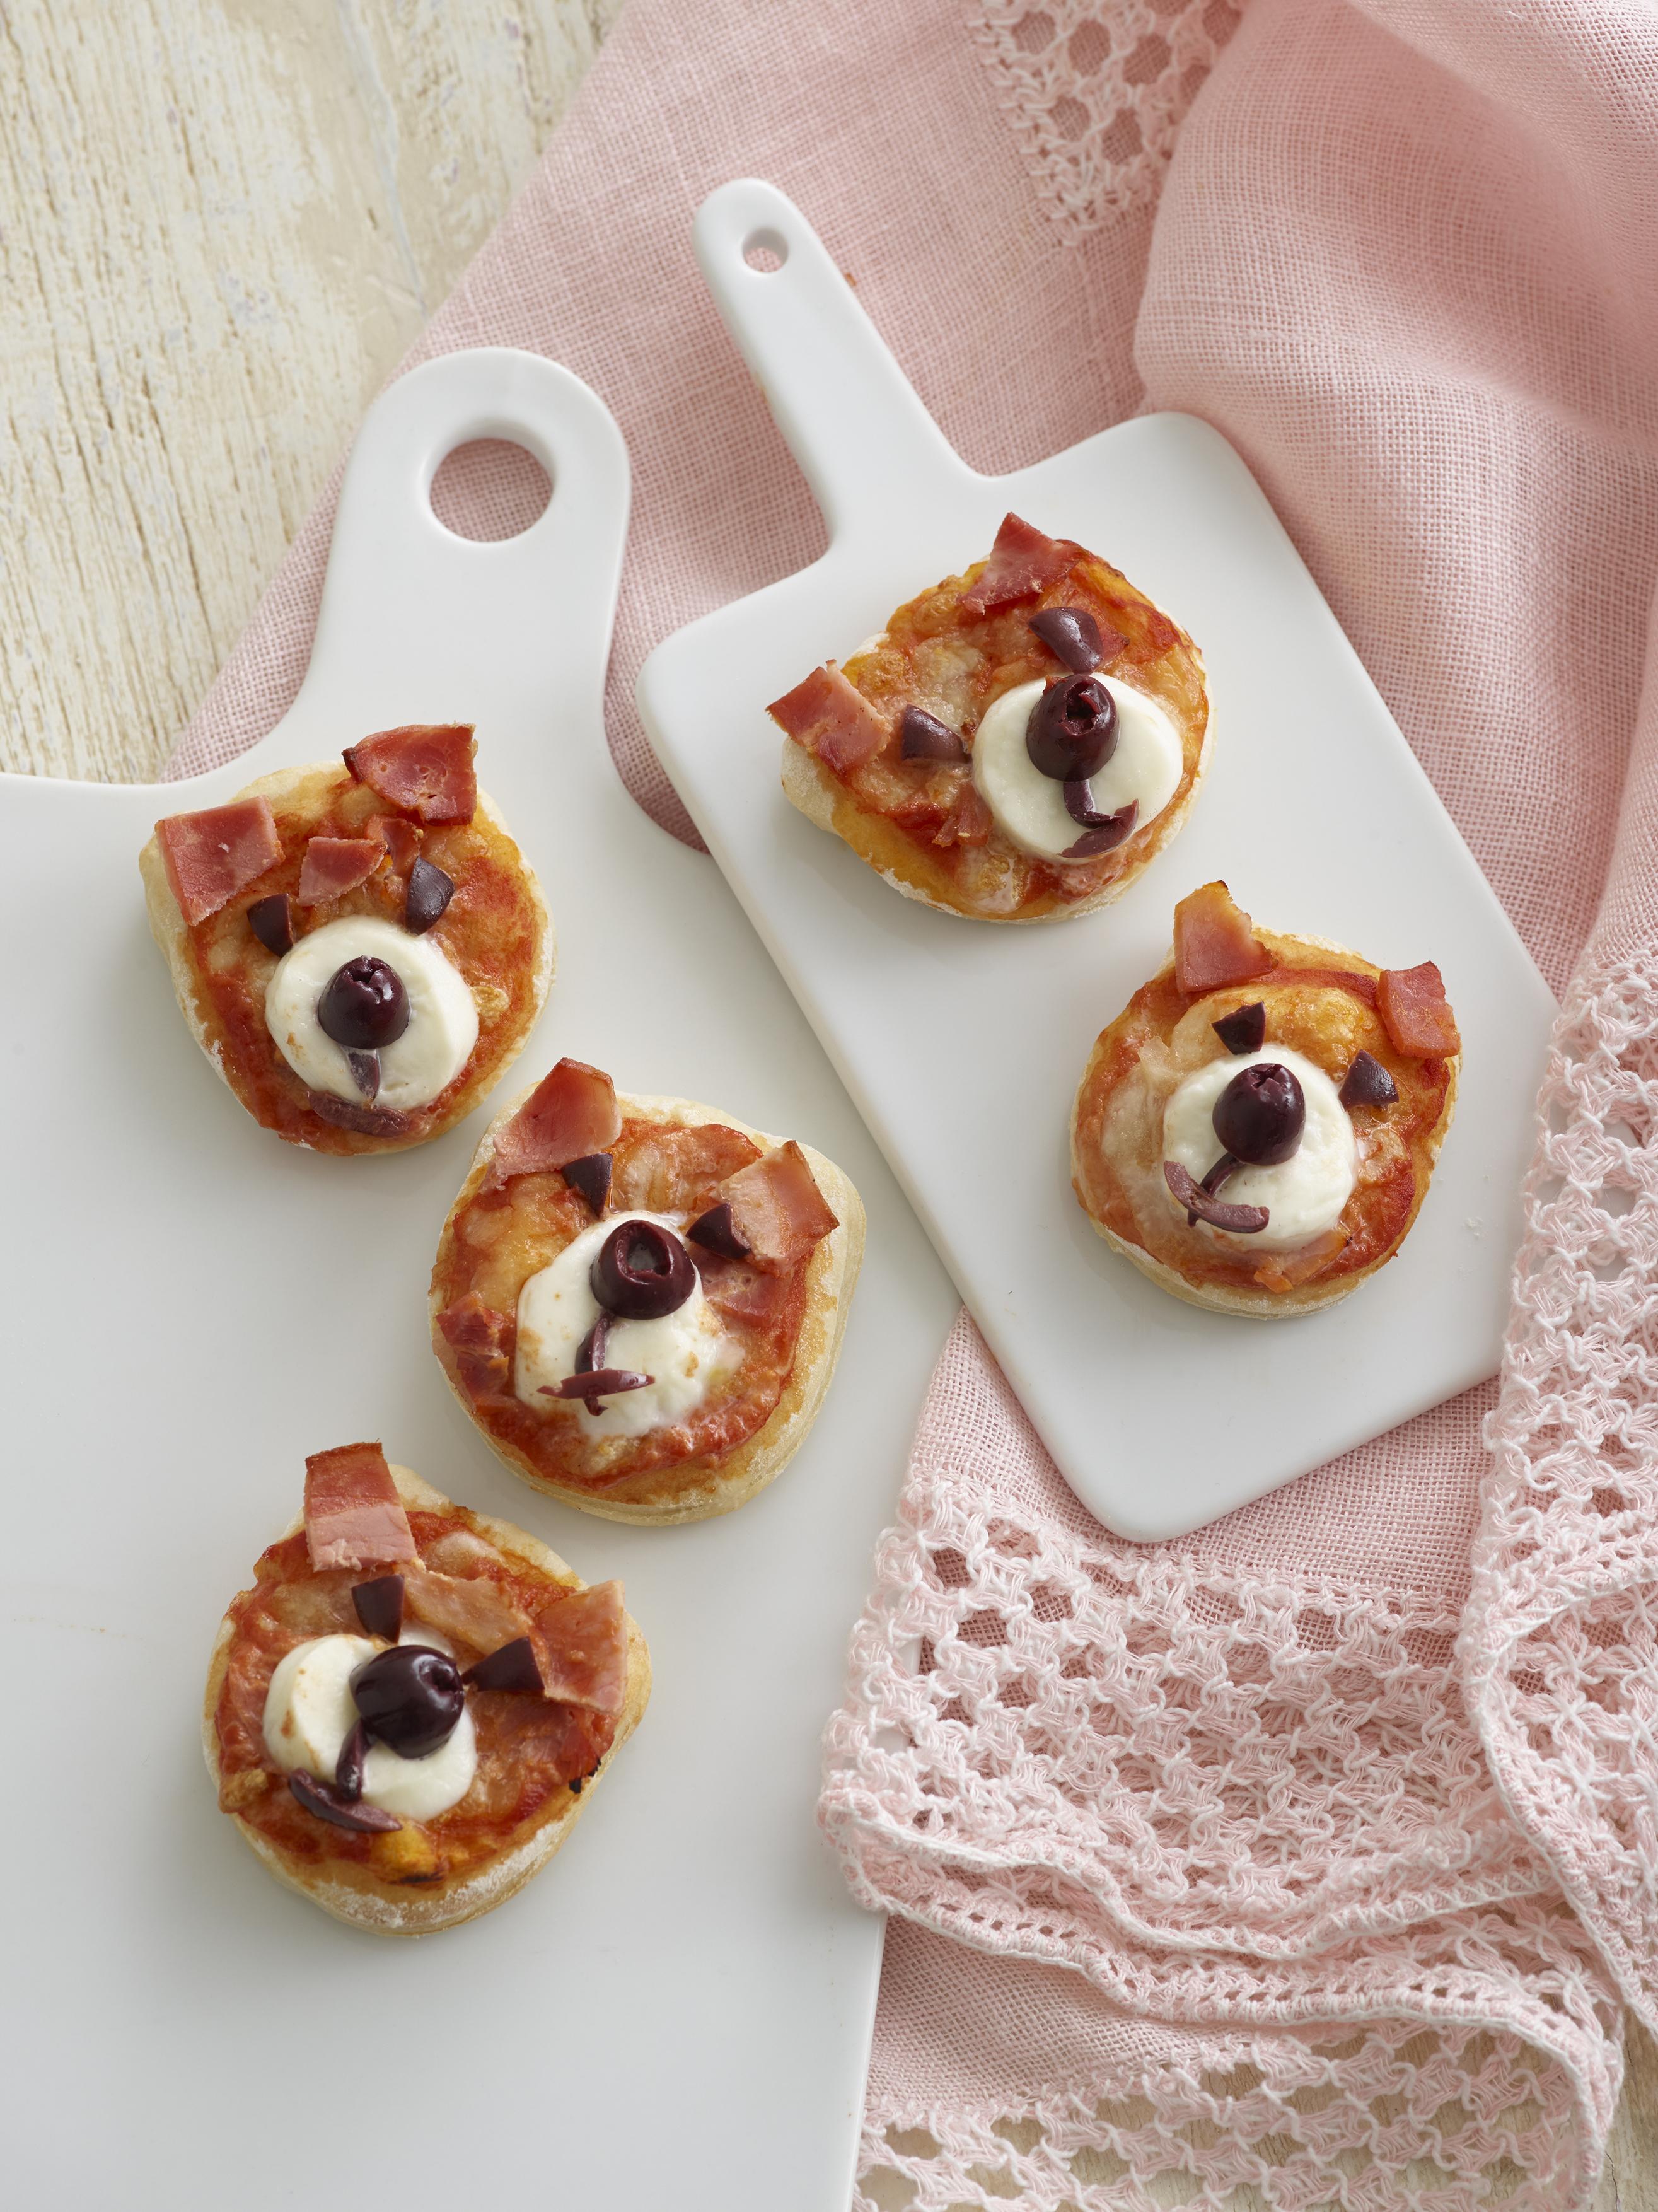 Teddy Bear Pizzas Annabel Karmel